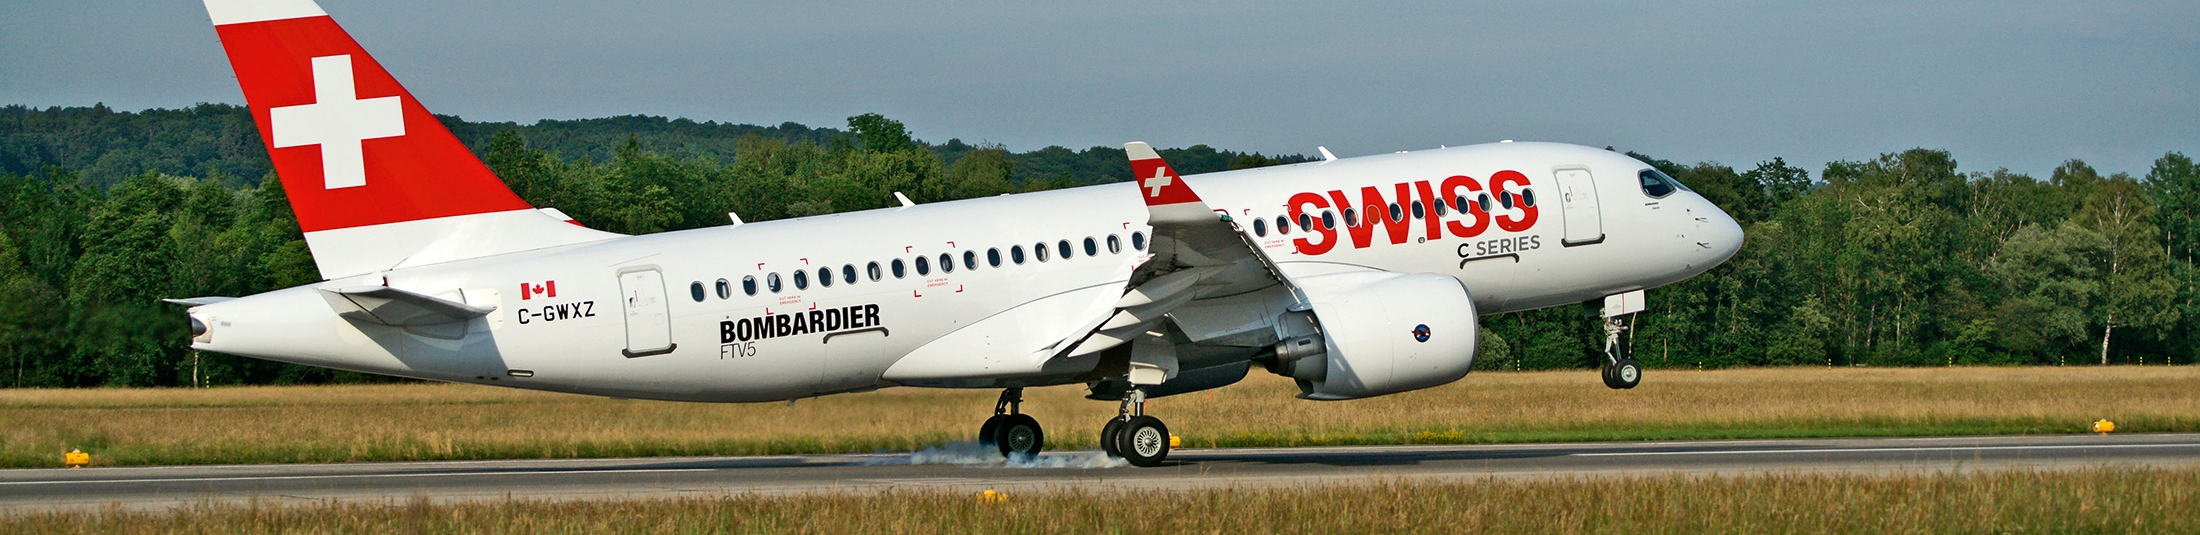 C-Serie Swiss